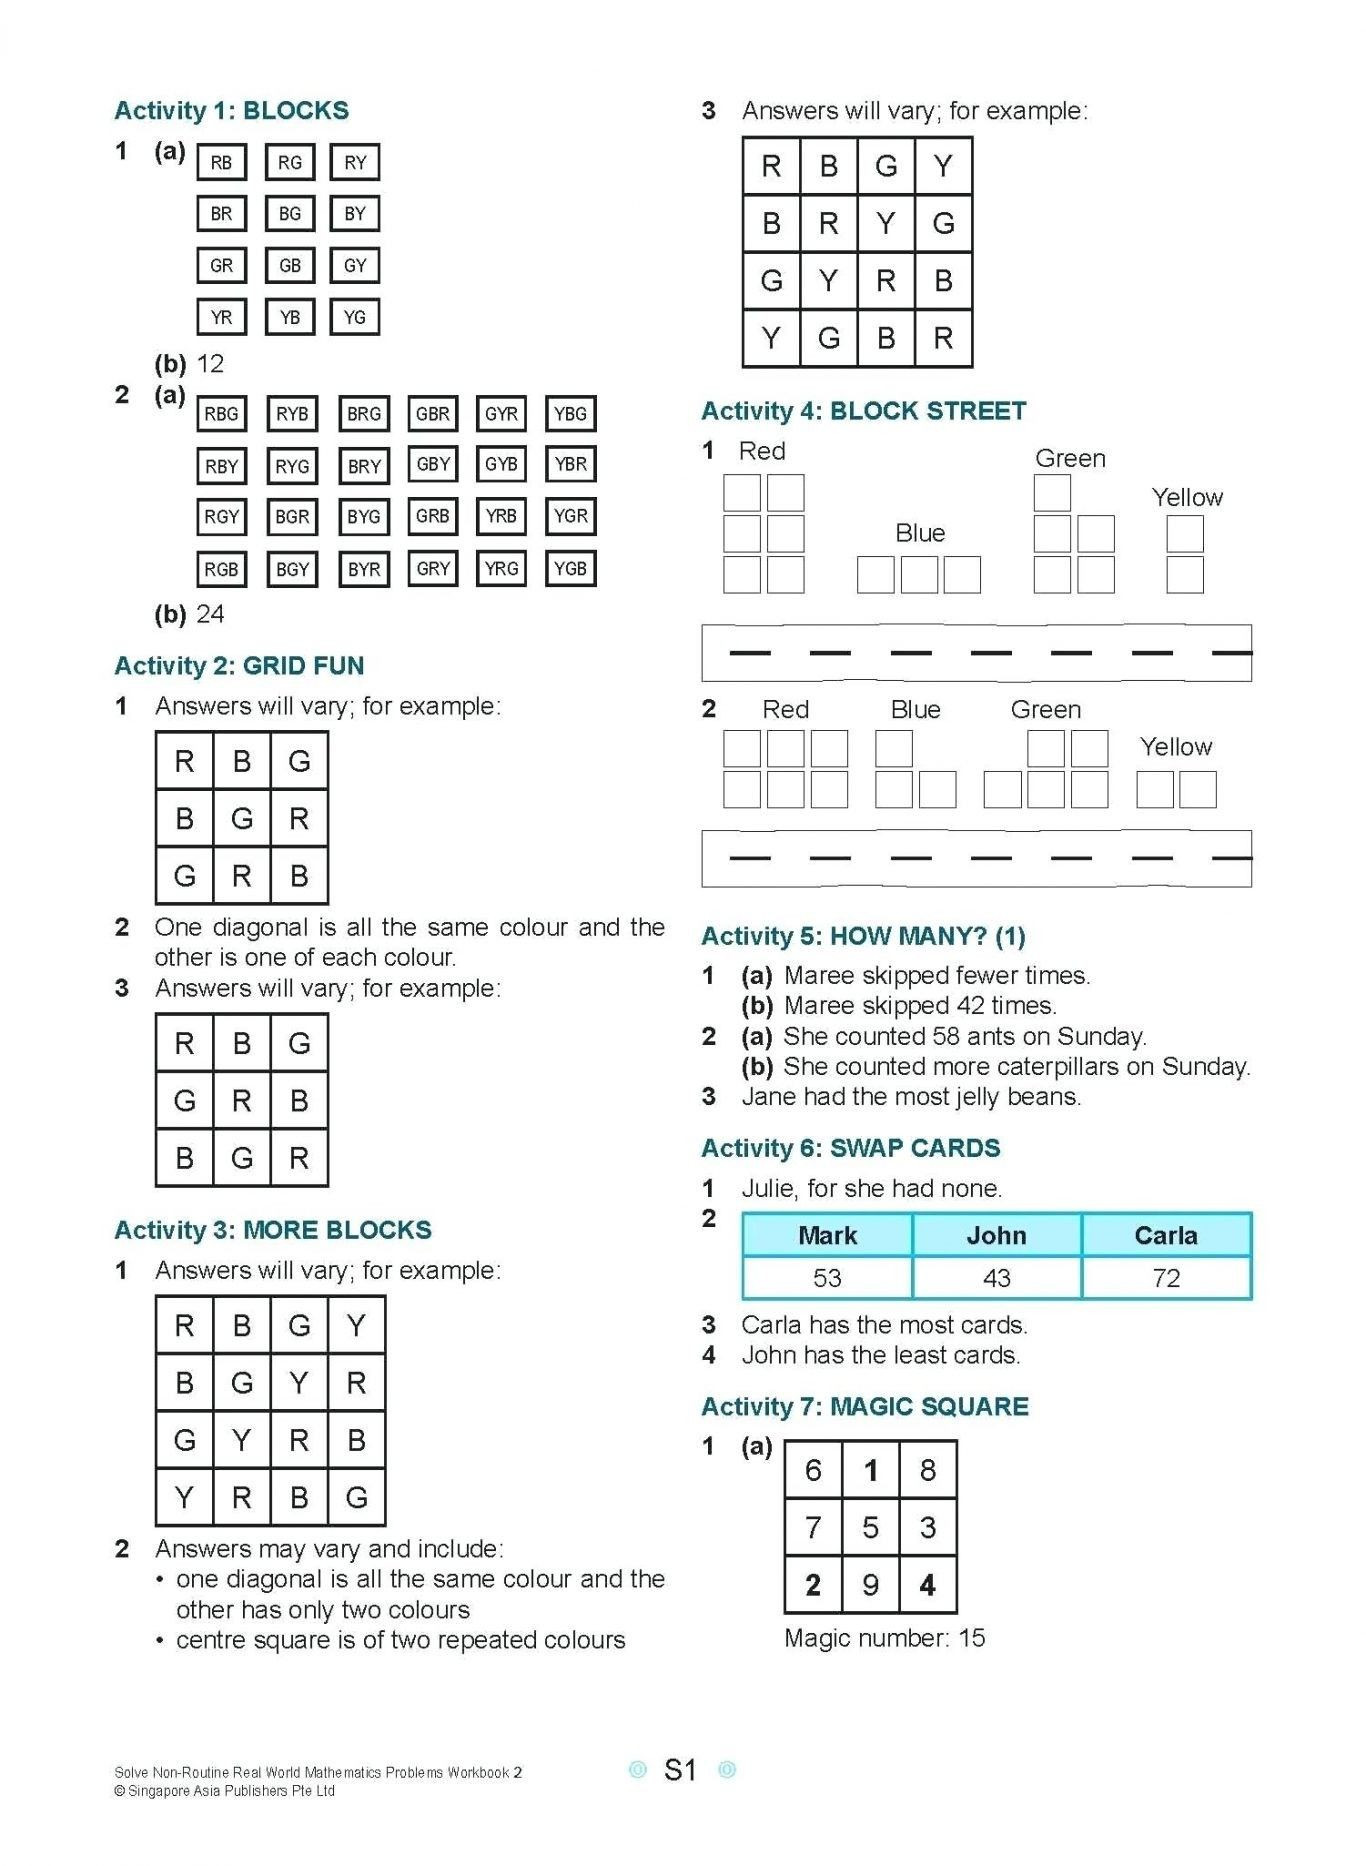 Estimating Square Root Worksheet Easy Square Root Worksheet